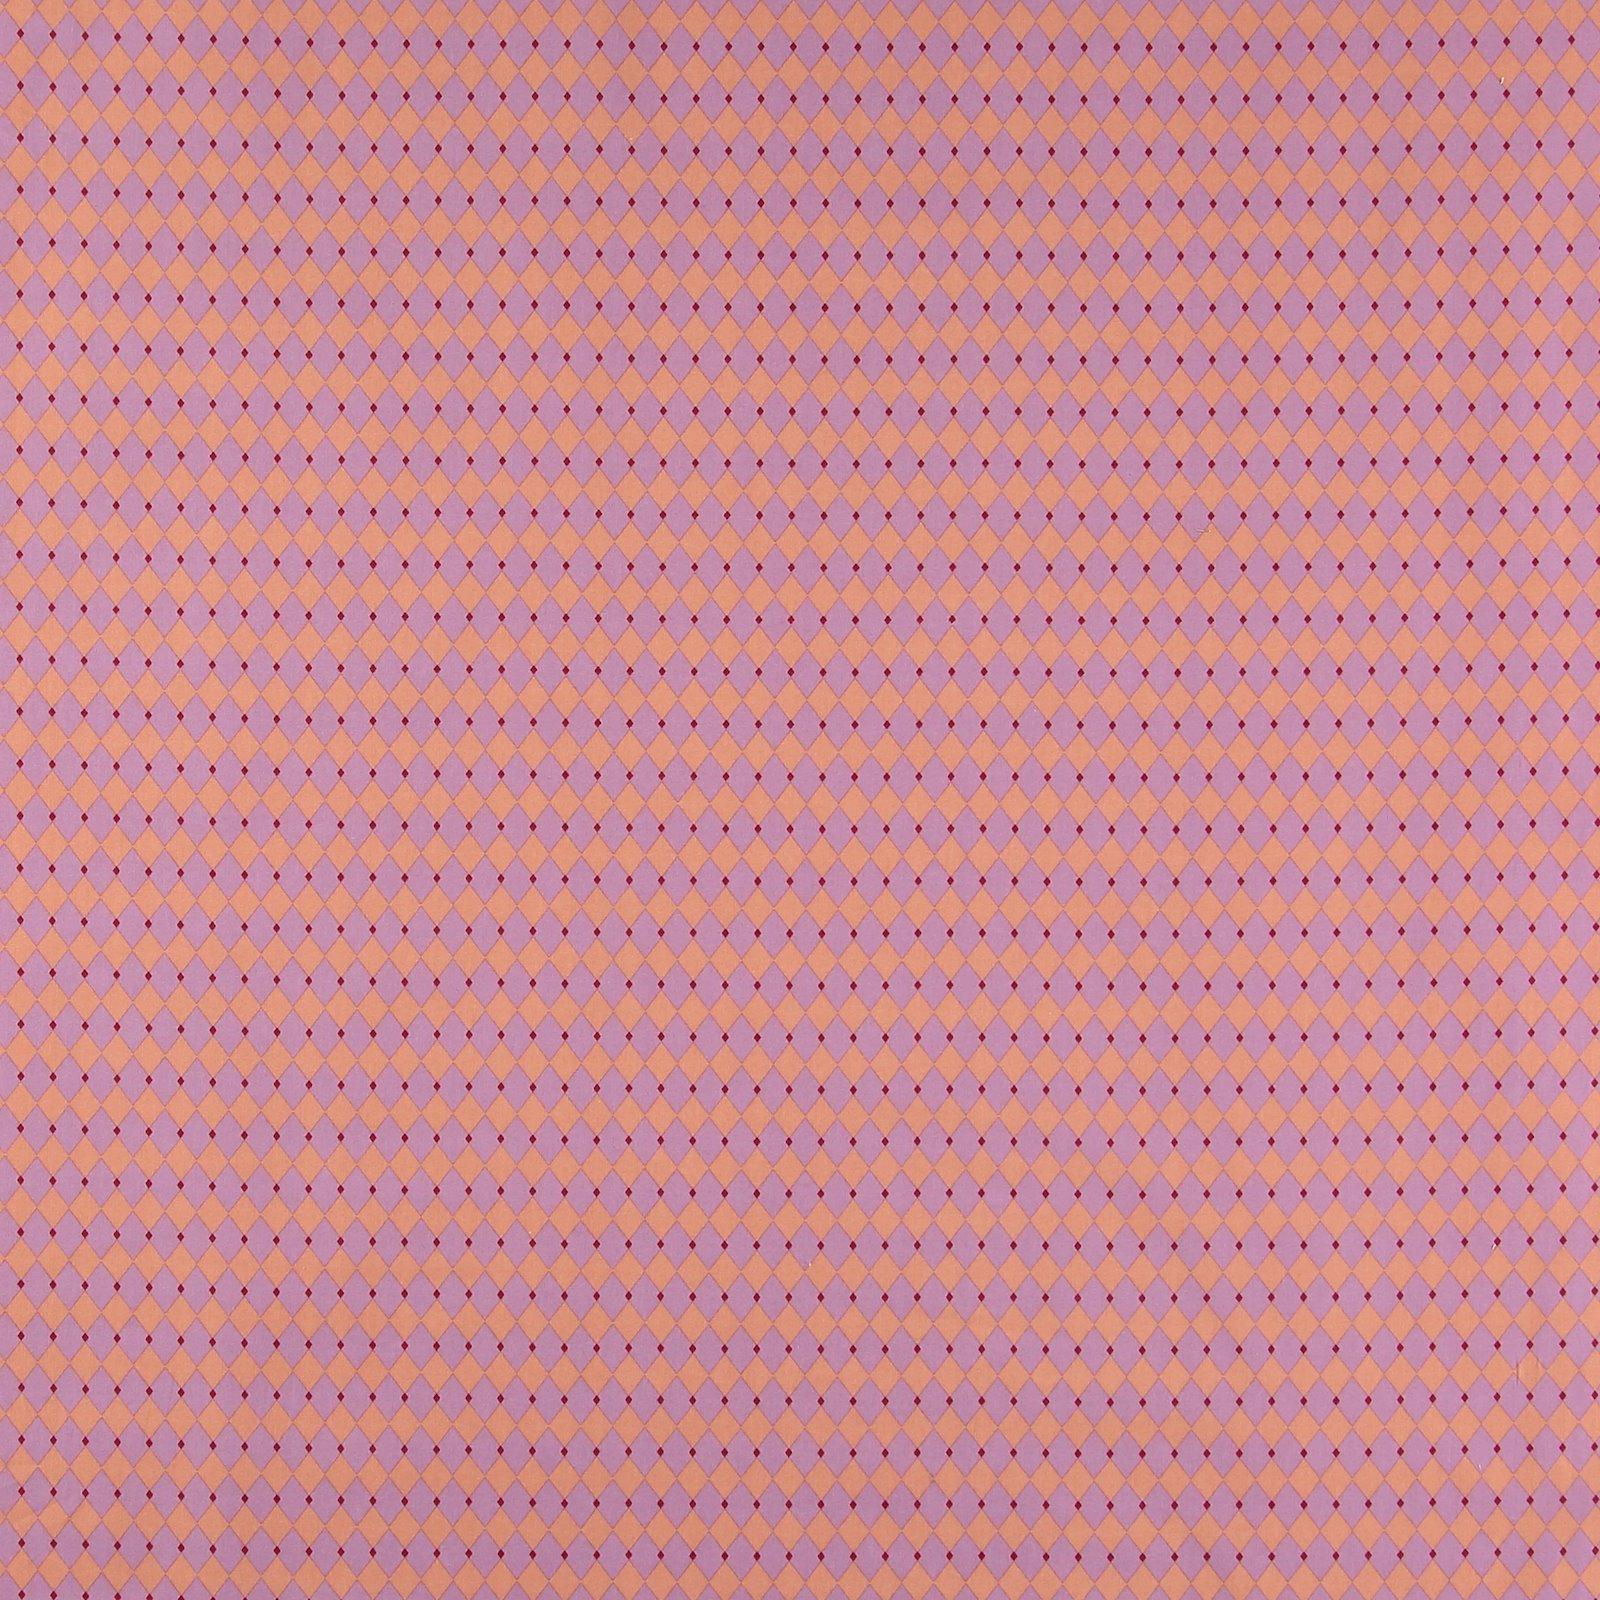 Cotton peach and violet diamonds 852410_pack_sp